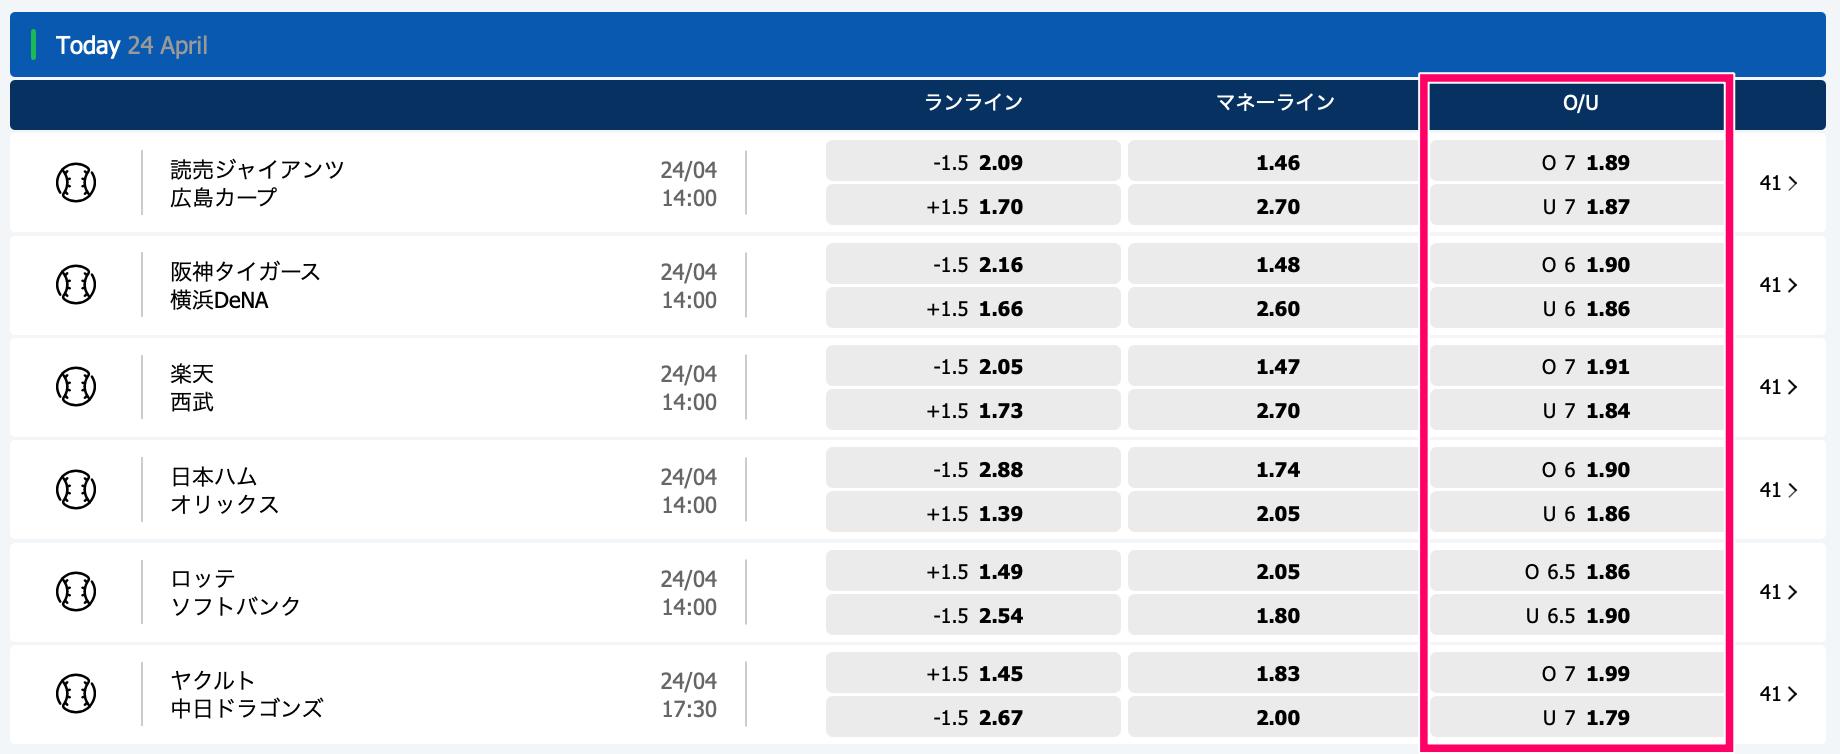 10bet Japan プロ野球やり方賭け方9・オーバーorアンダー o/u